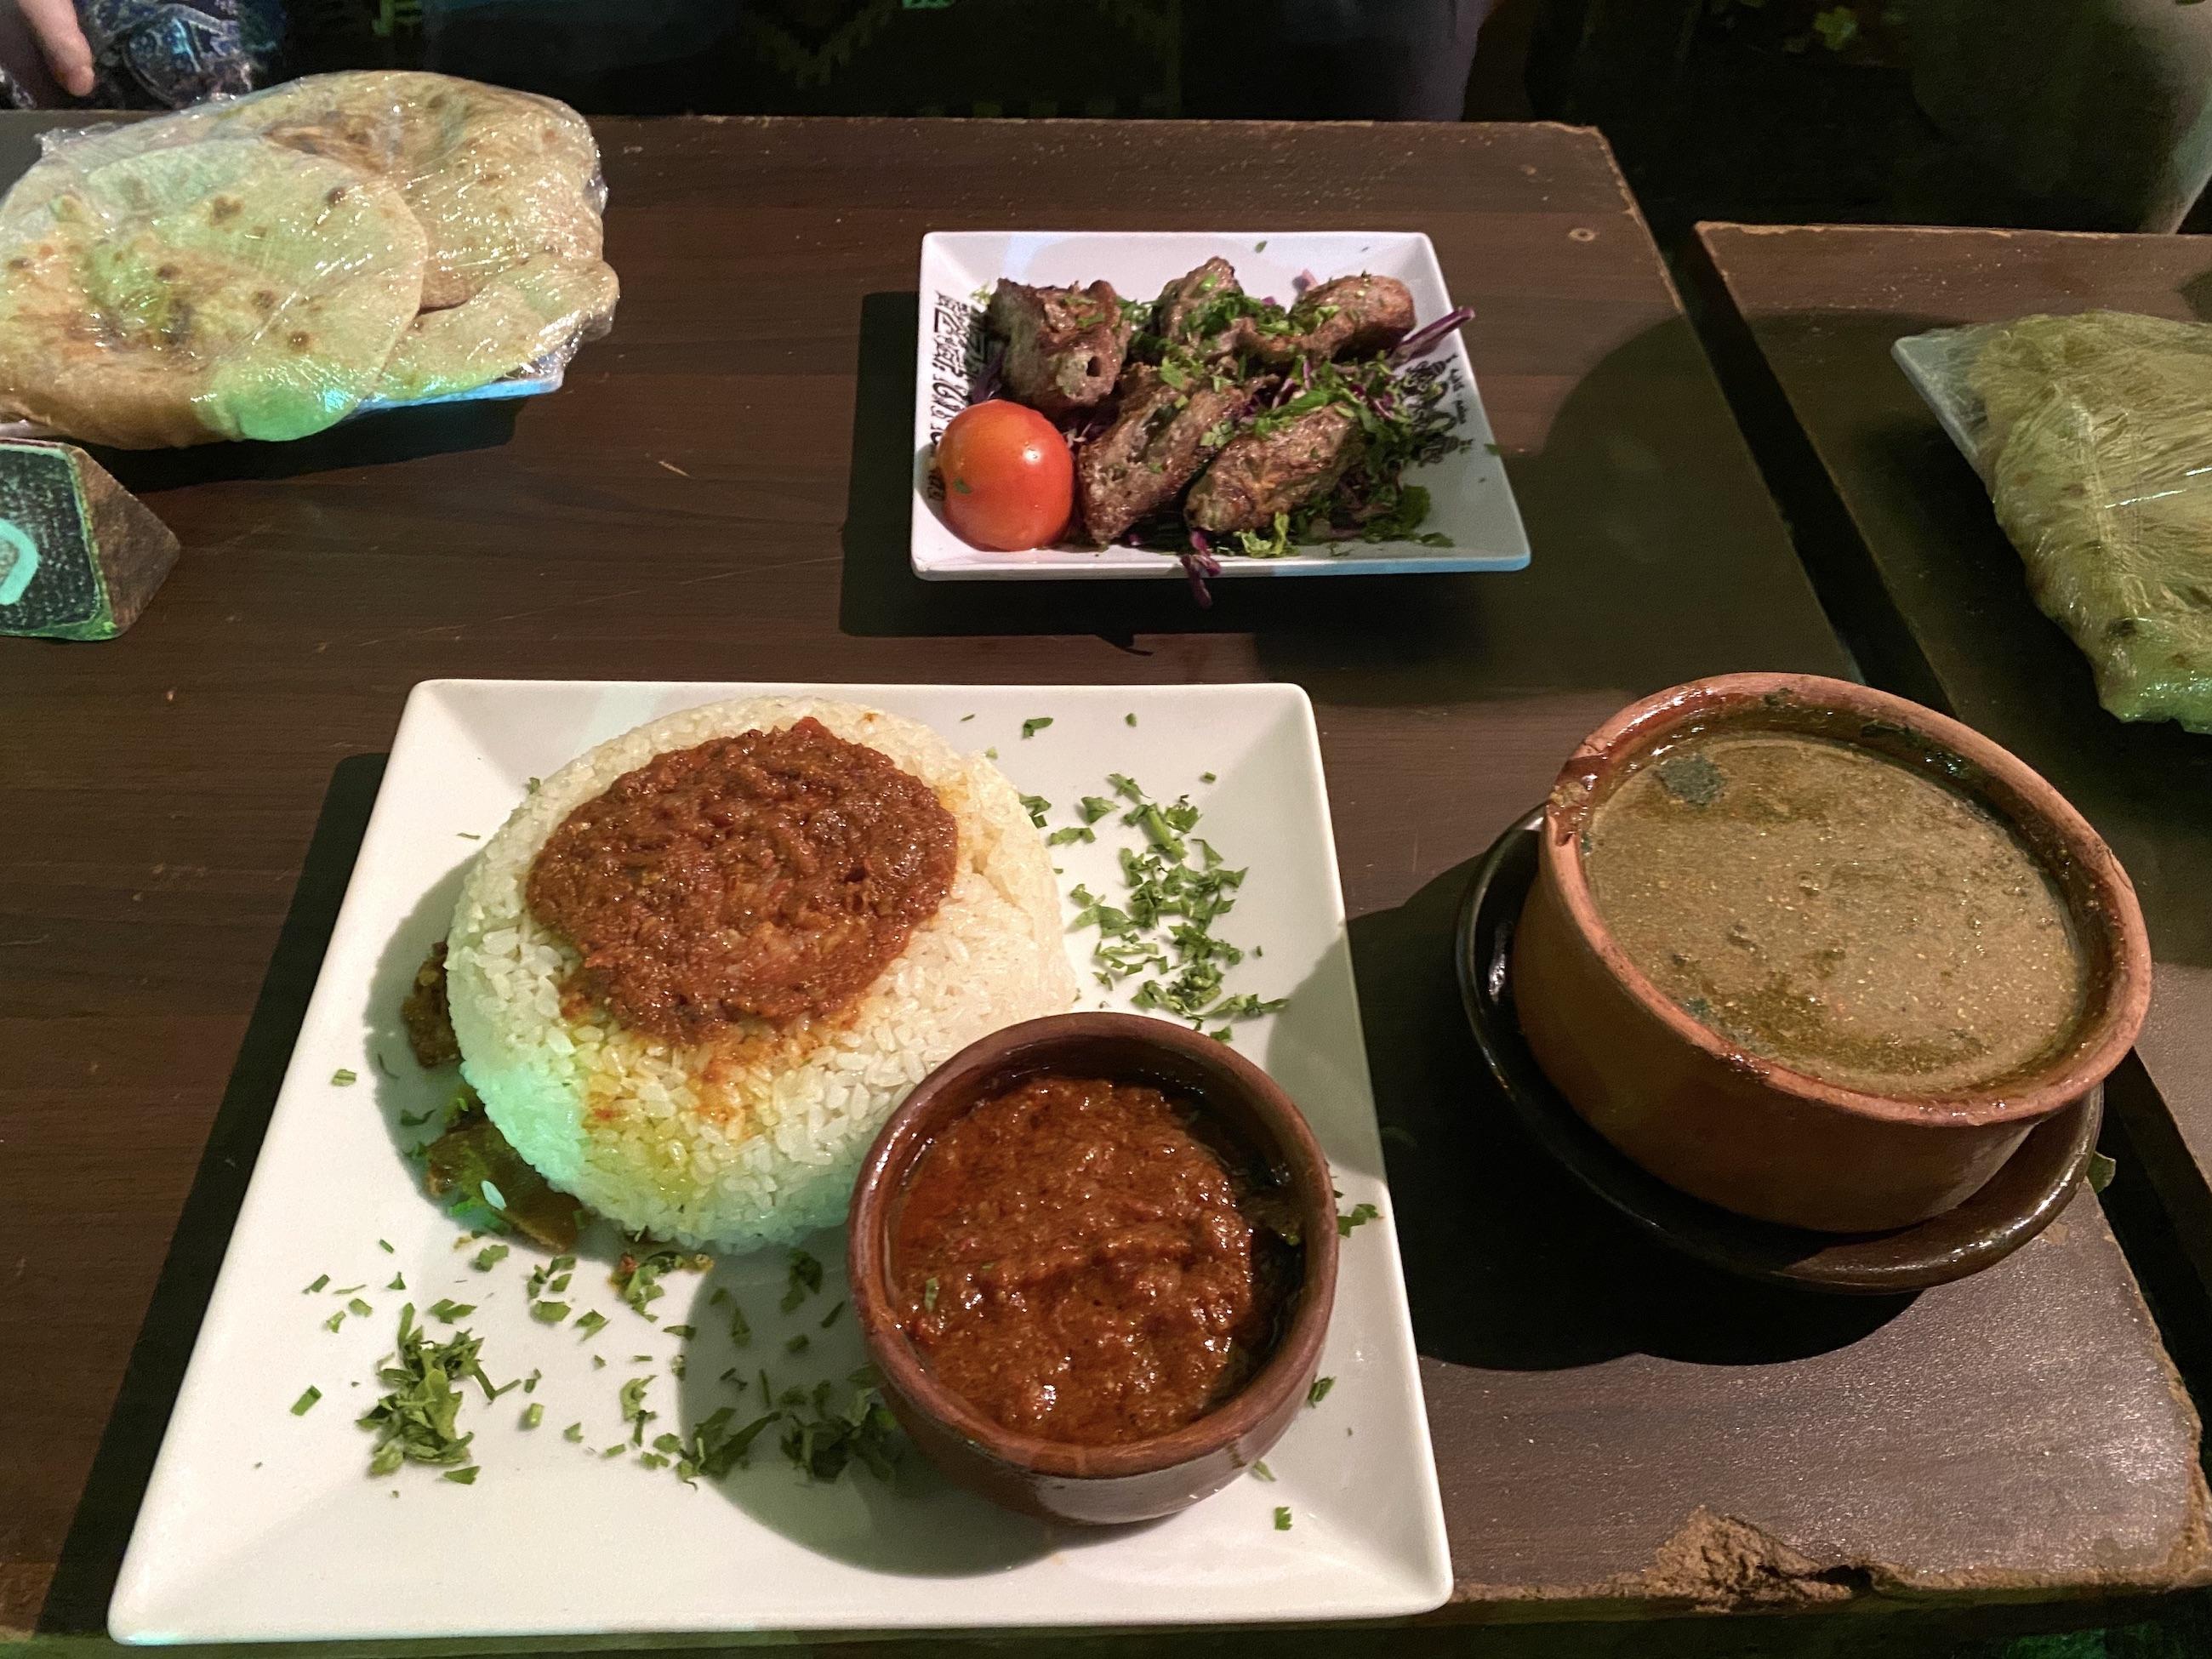 https://bubo.sk/uploads/galleries/18745/gstro-jedlo-na-stole-kahira.jpg